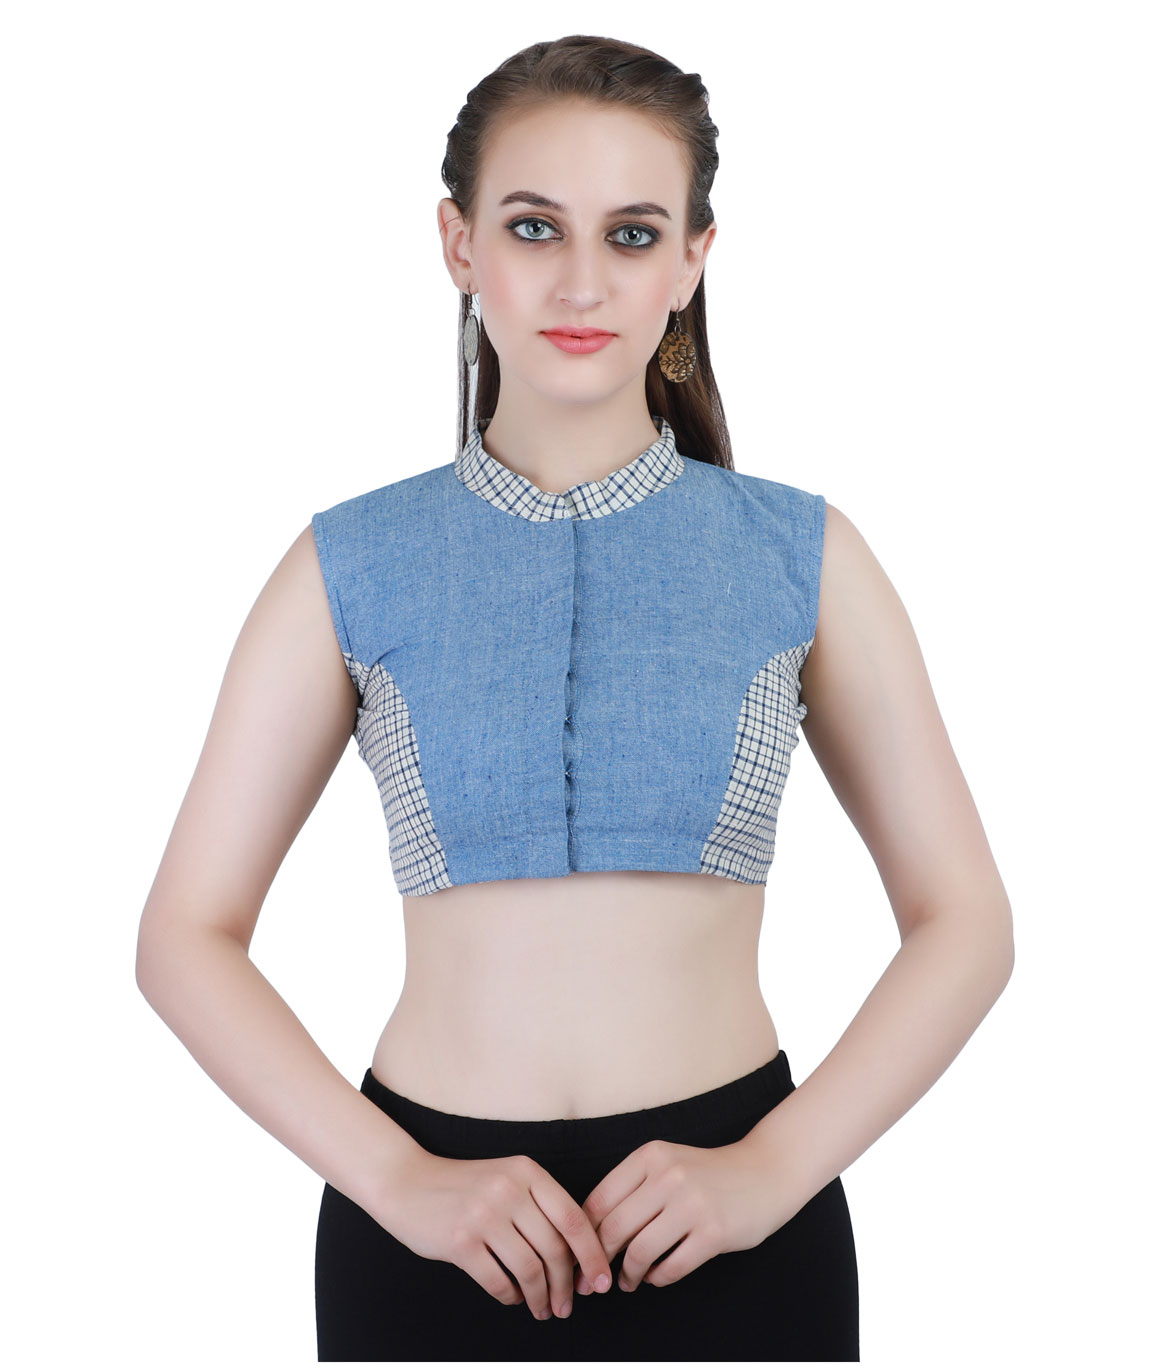 Handloom Pure Cotton khadi Checks Front-Open Blouse in Denim Blue